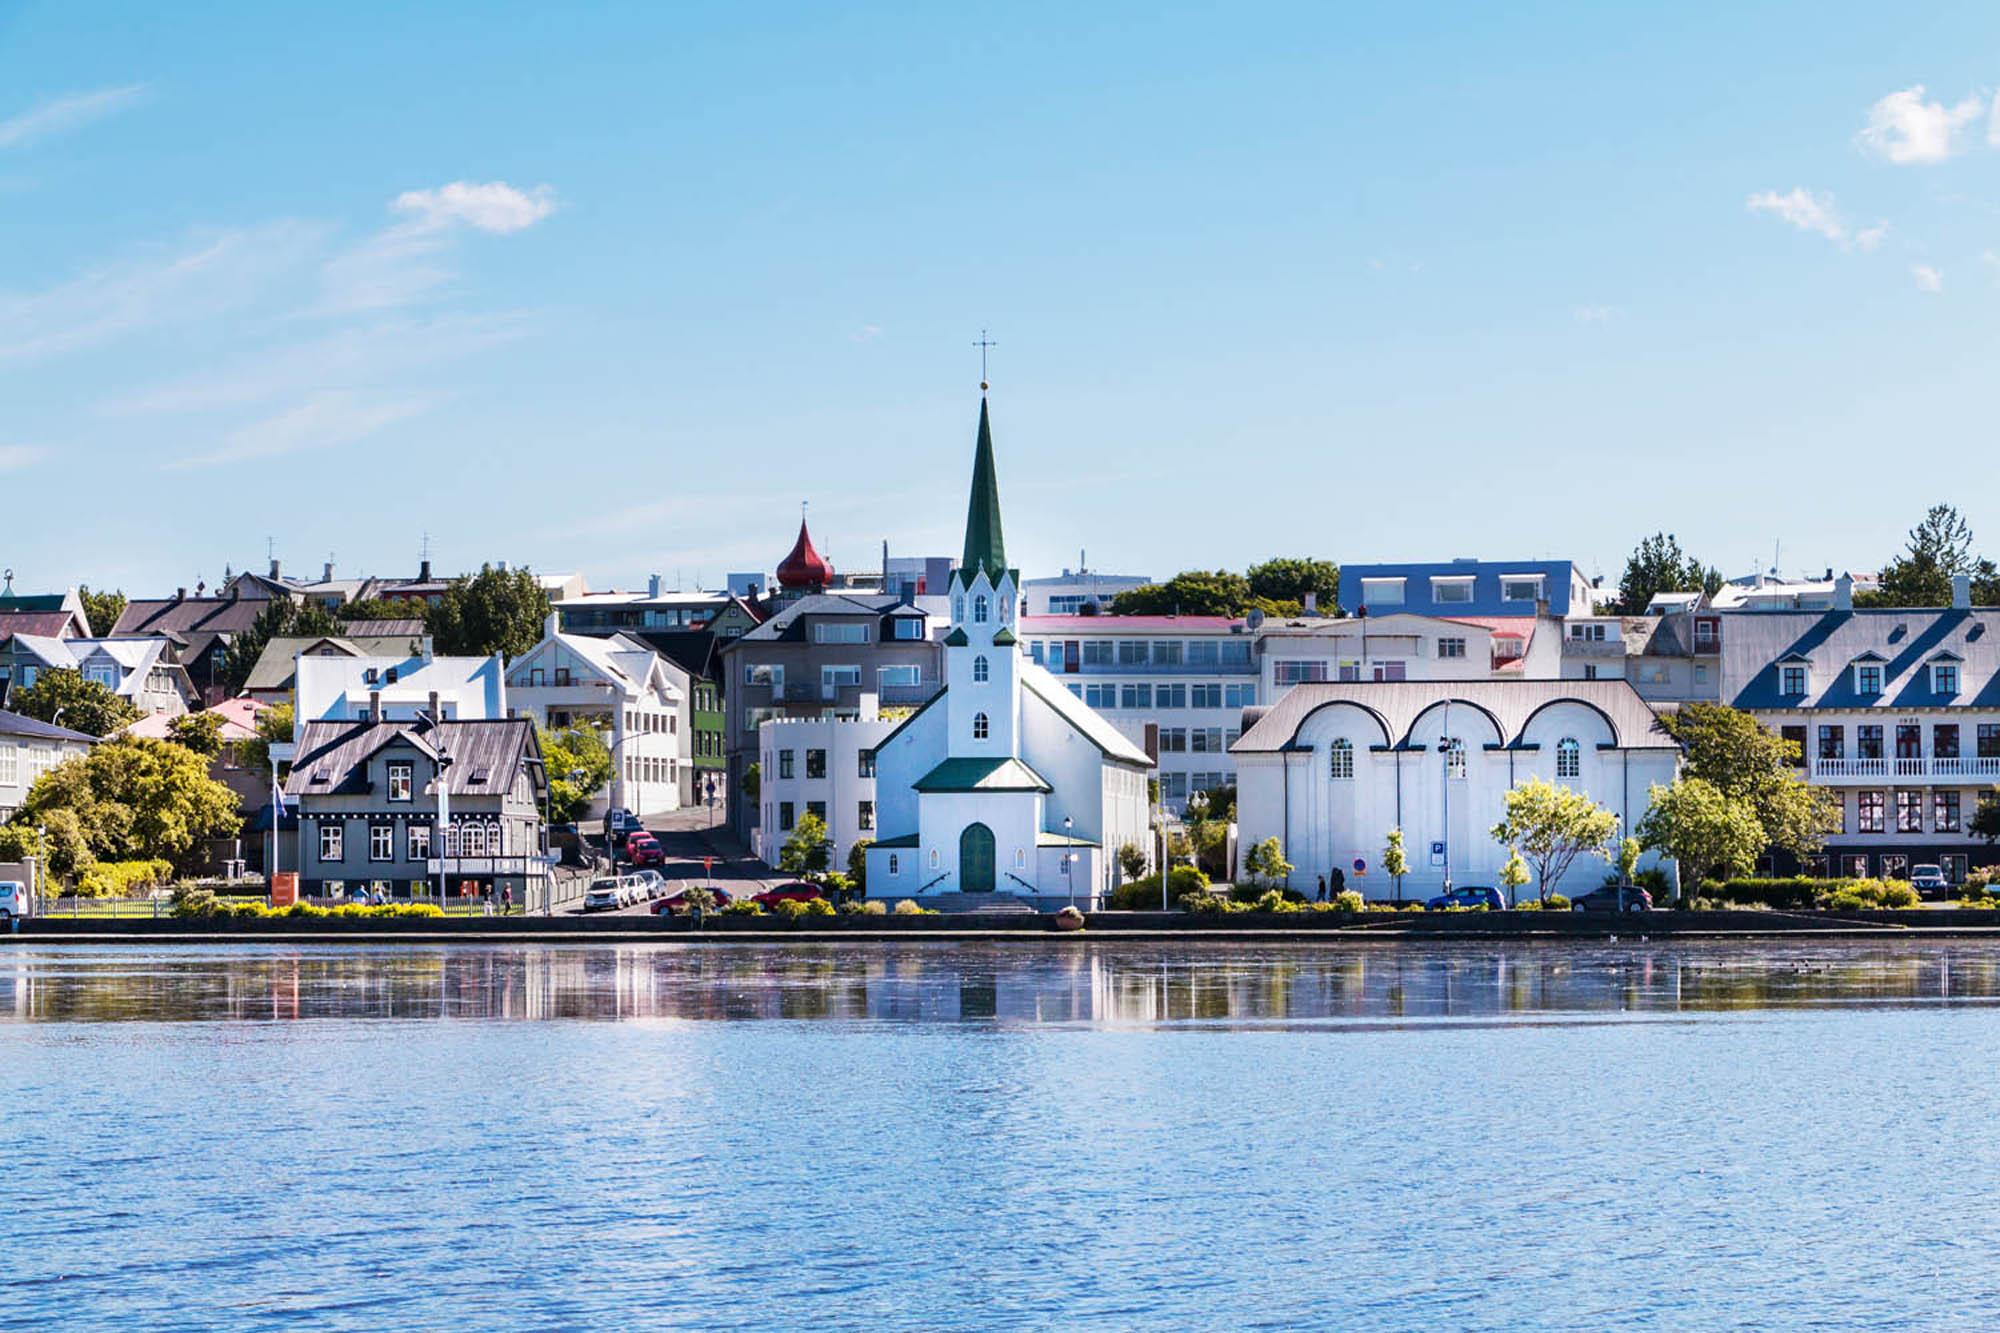 Reykjavík - Fríkirkjan and the pond